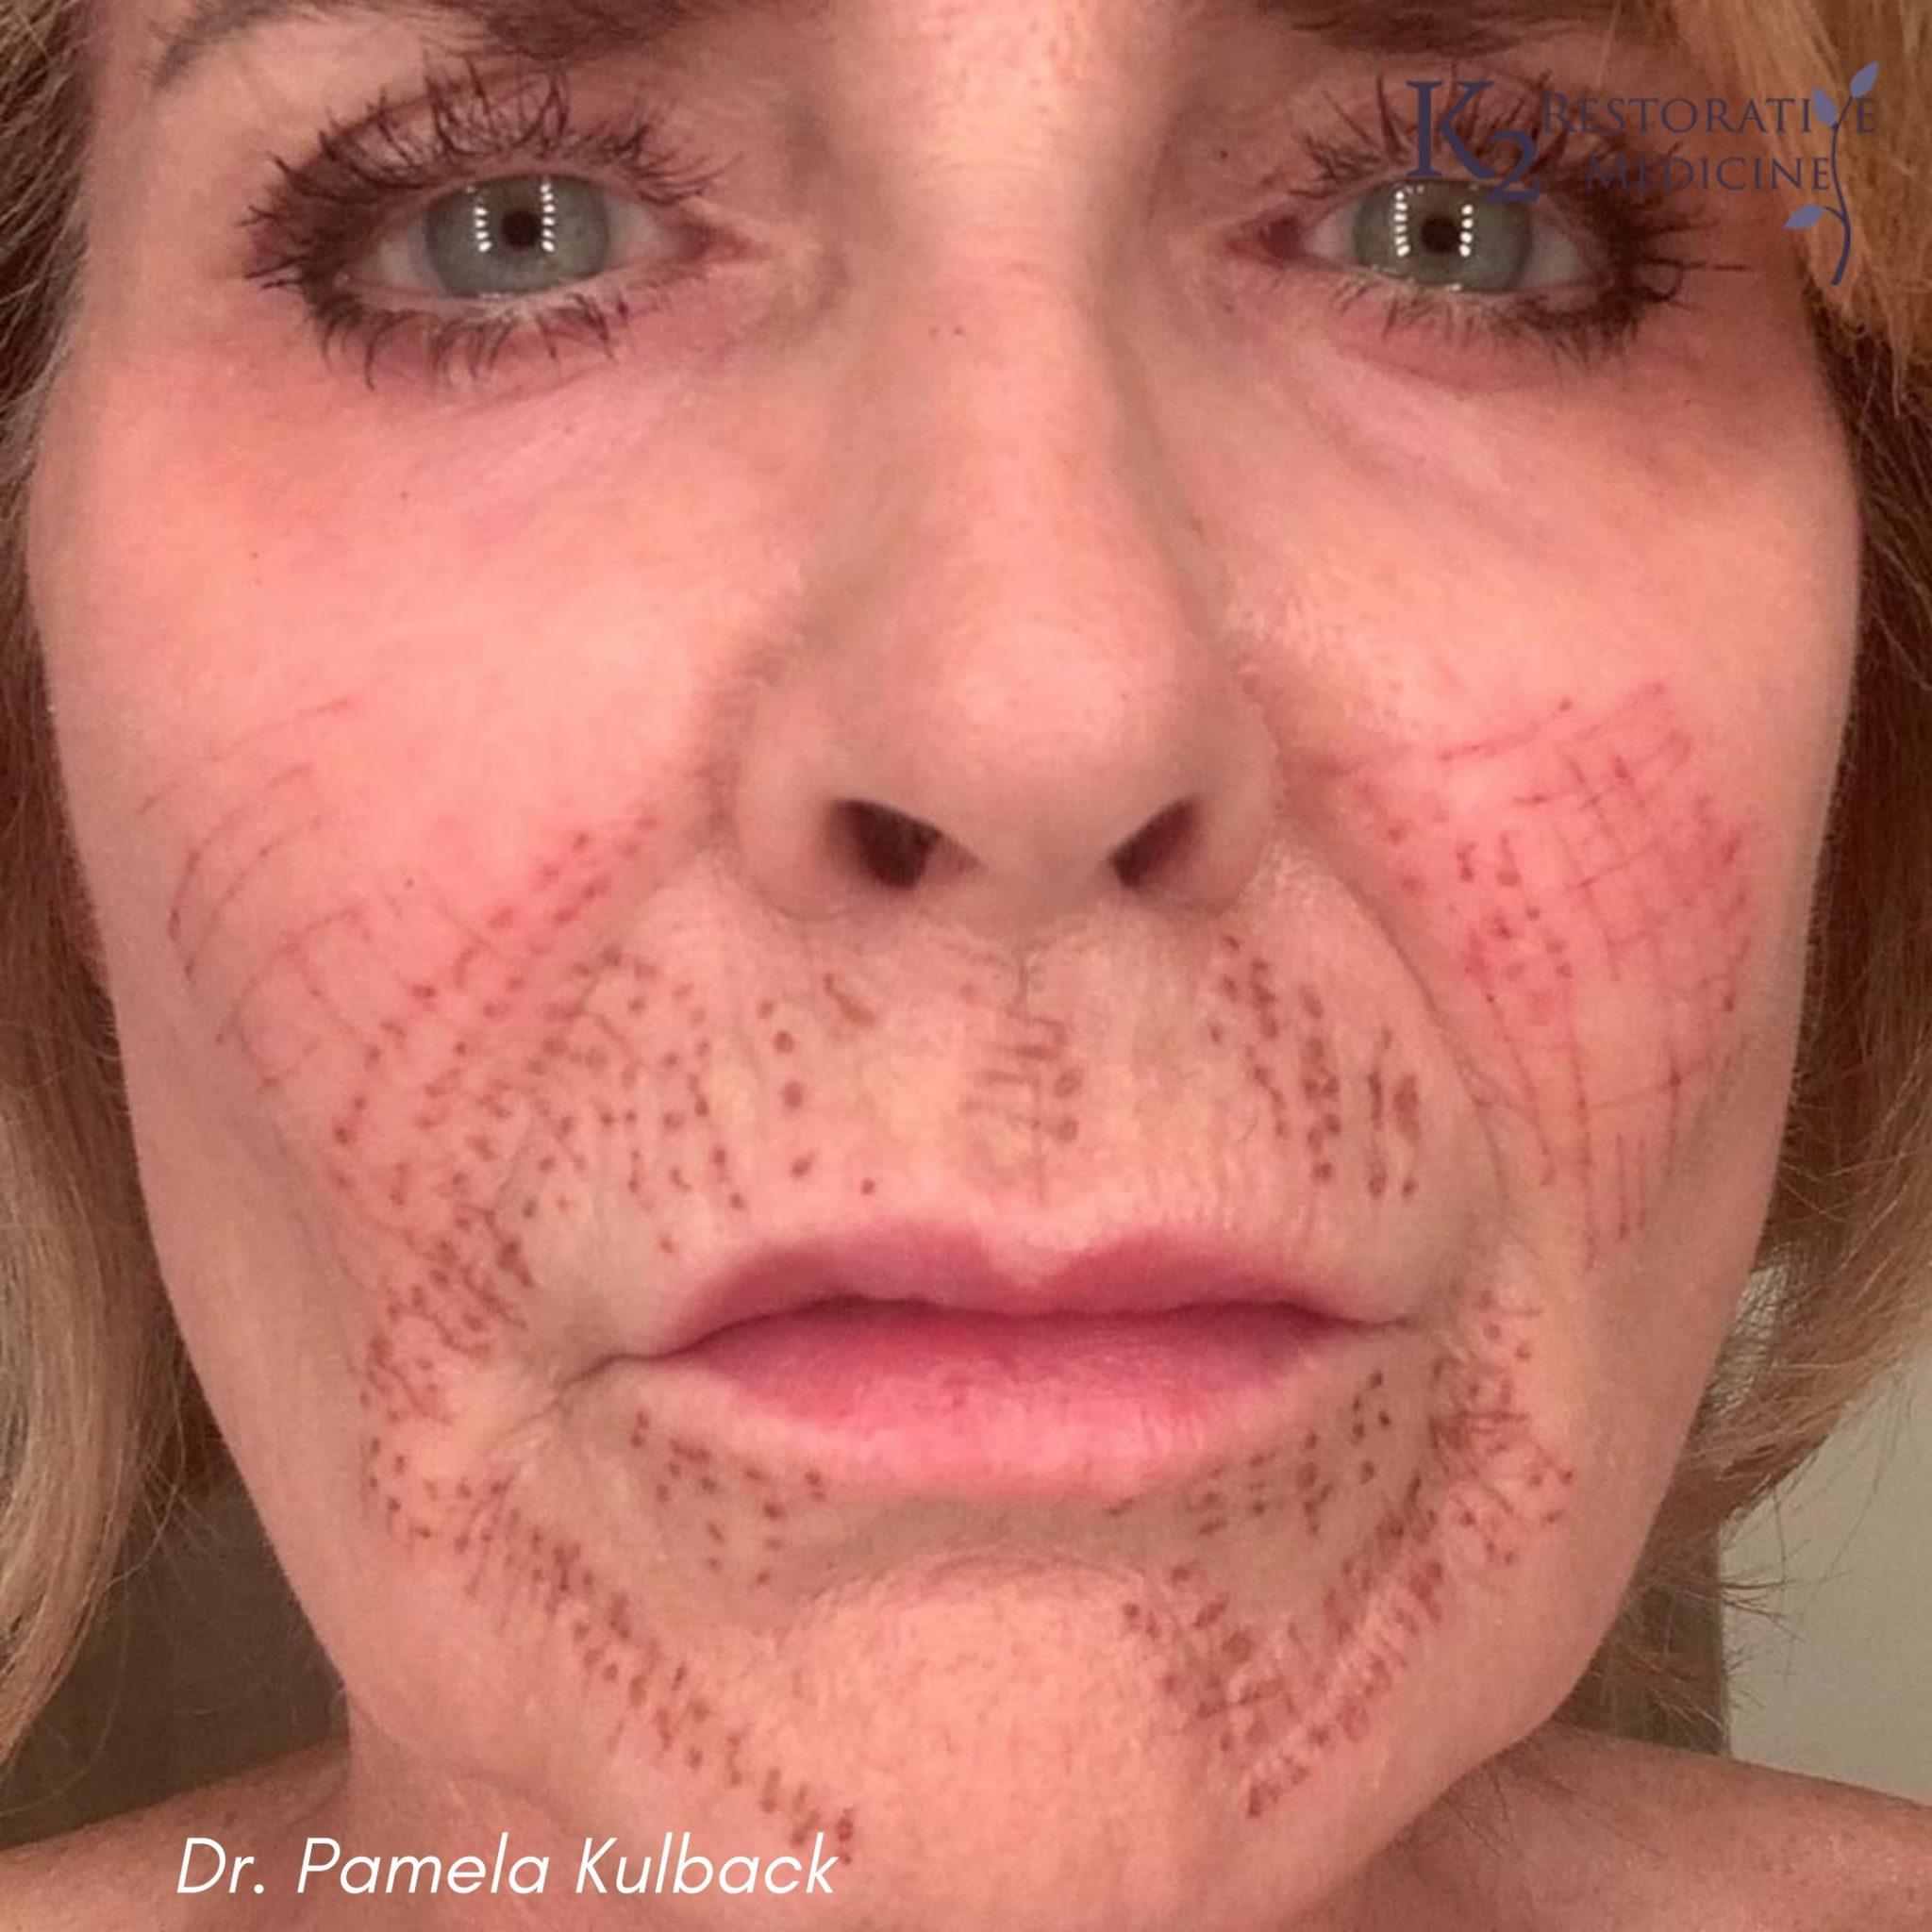 2 Days Post Subnovii Plasma Pen Treatment of the lower face by Dr. Pamela Kulback